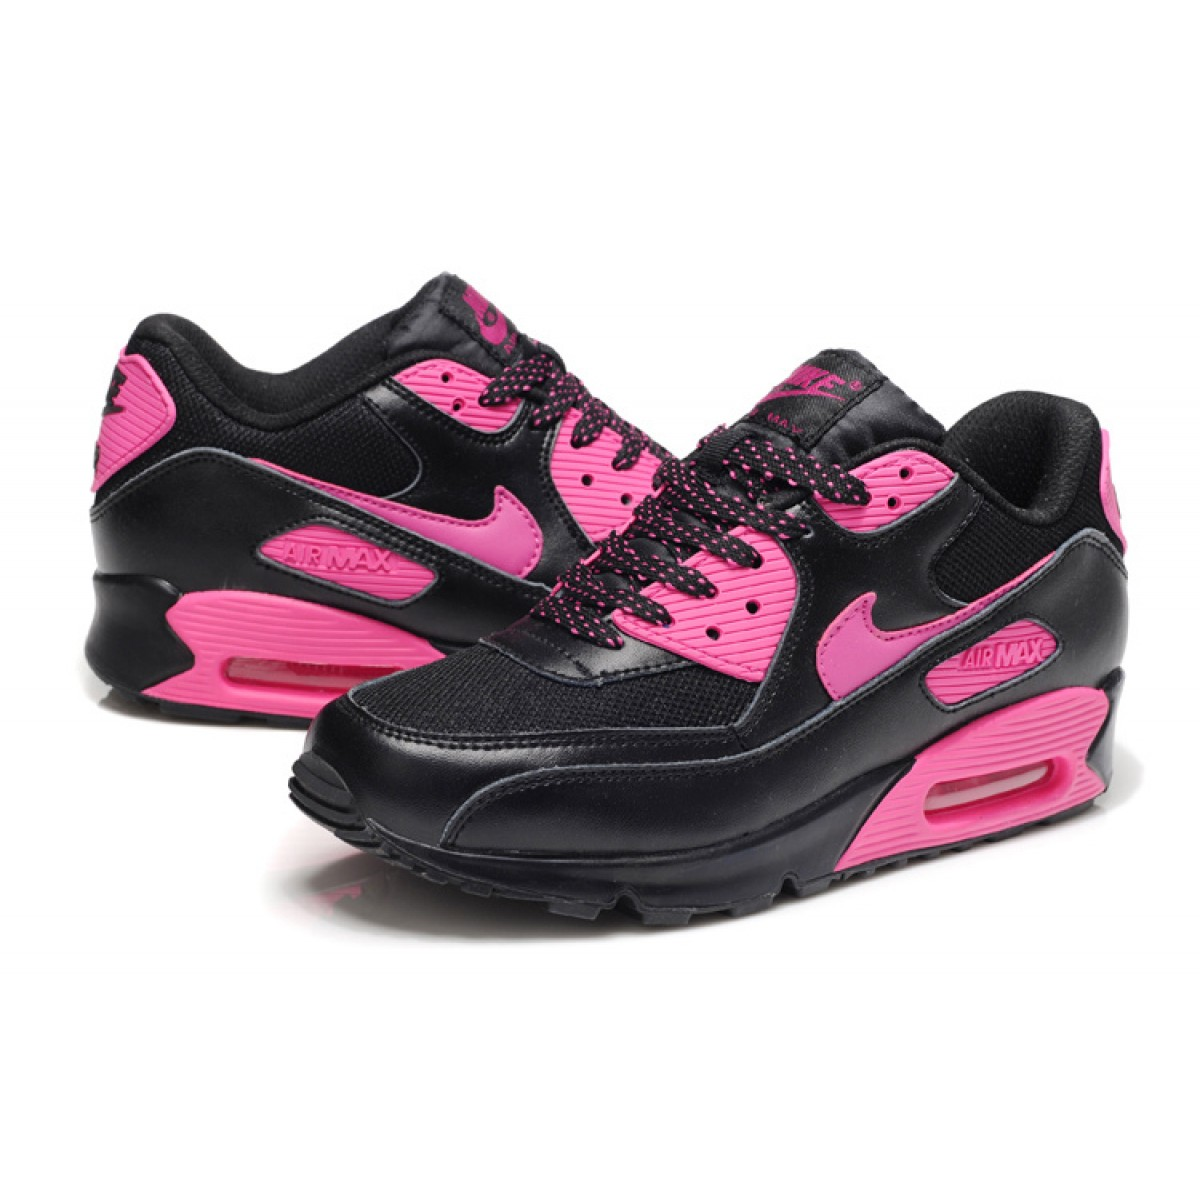 air max 90 femmes rose et noir